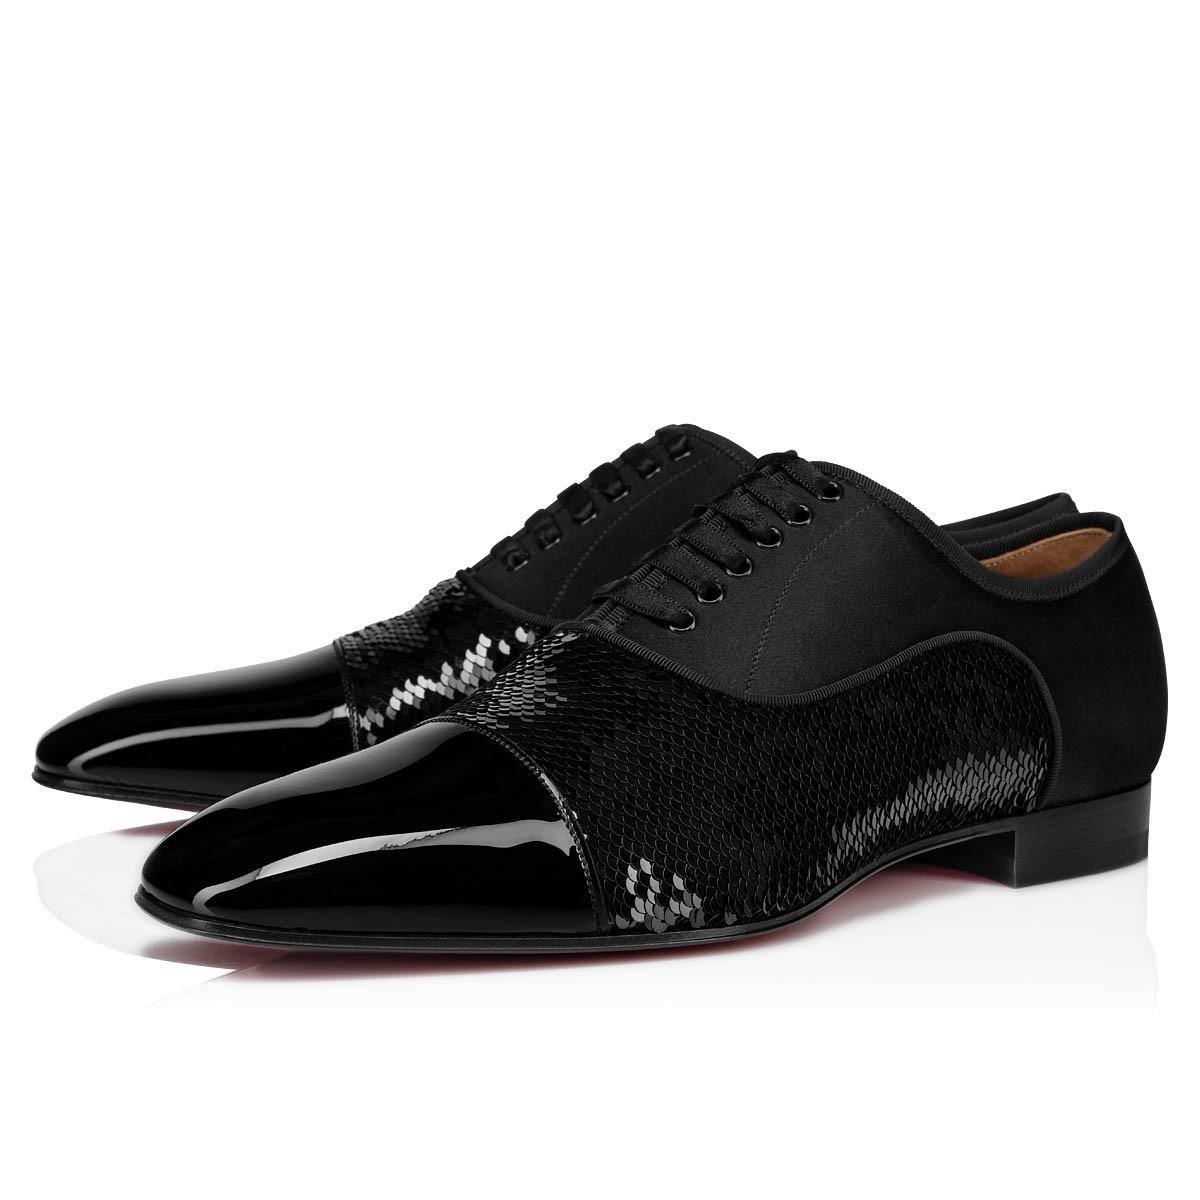 Супер дизайнер Мужчины Red Bottom тапки замши с Rhinestone LowTop Мода Red Bottom кроссовки Юниор Люкс Дизайн Повседневная обувь